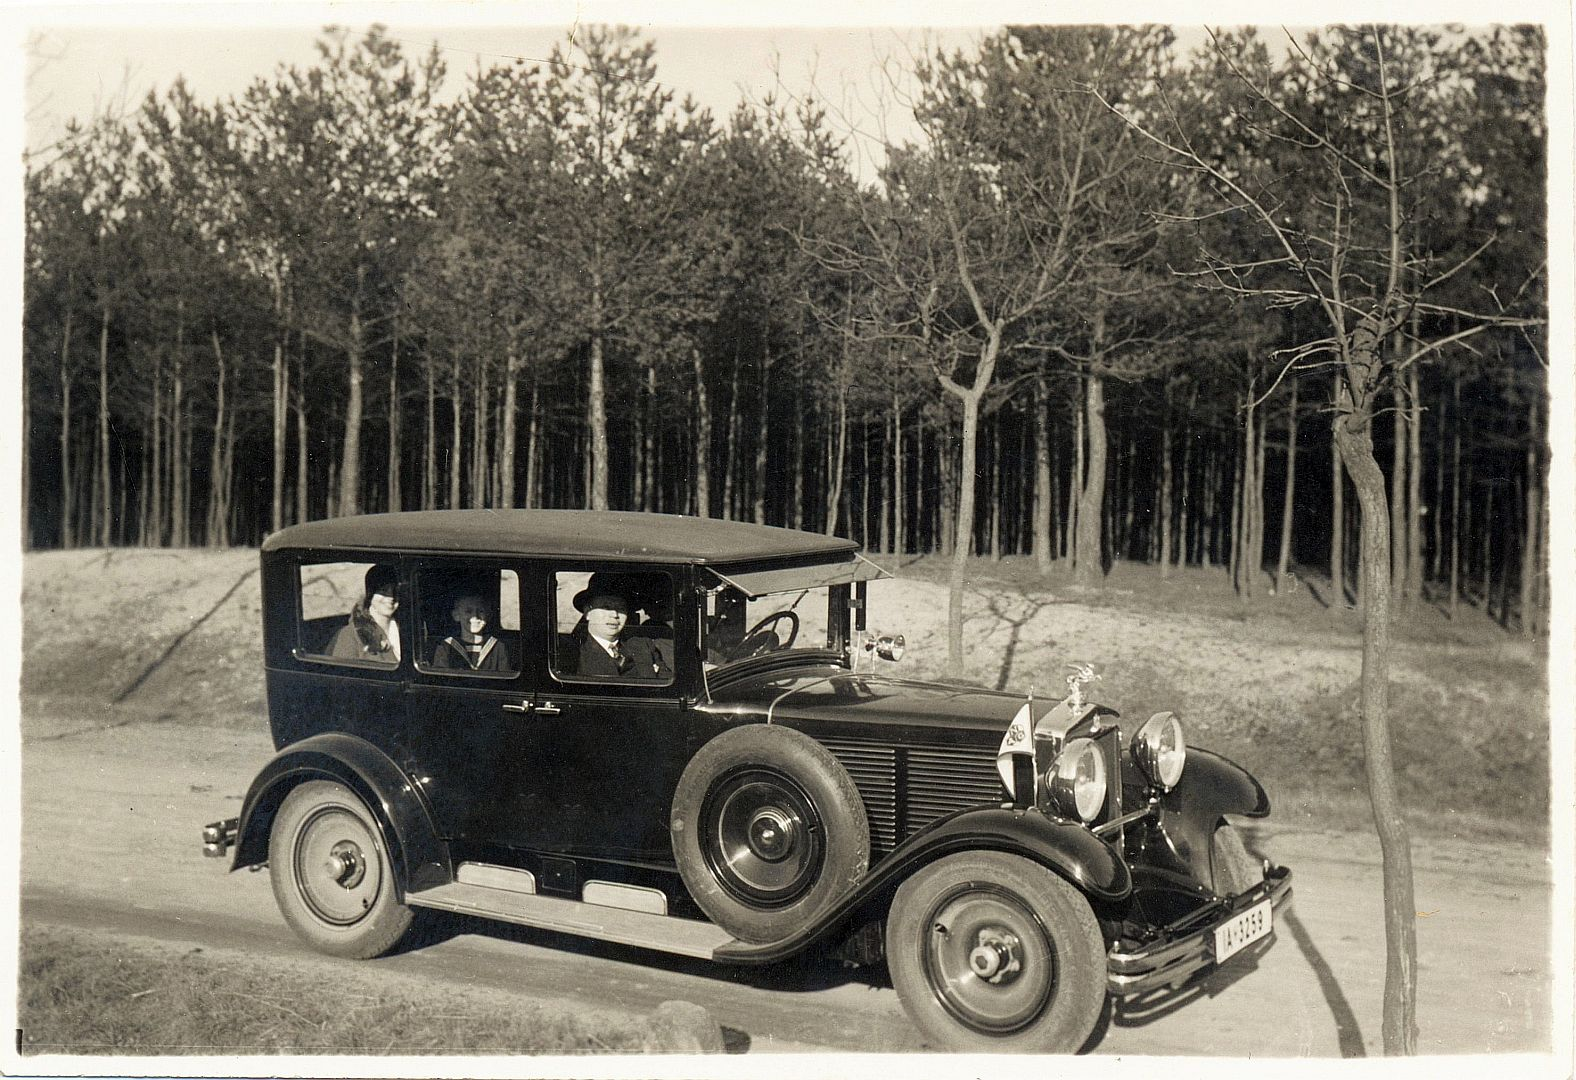 nag_protos_14-70_ps_pullman-limousine_1929_galerie